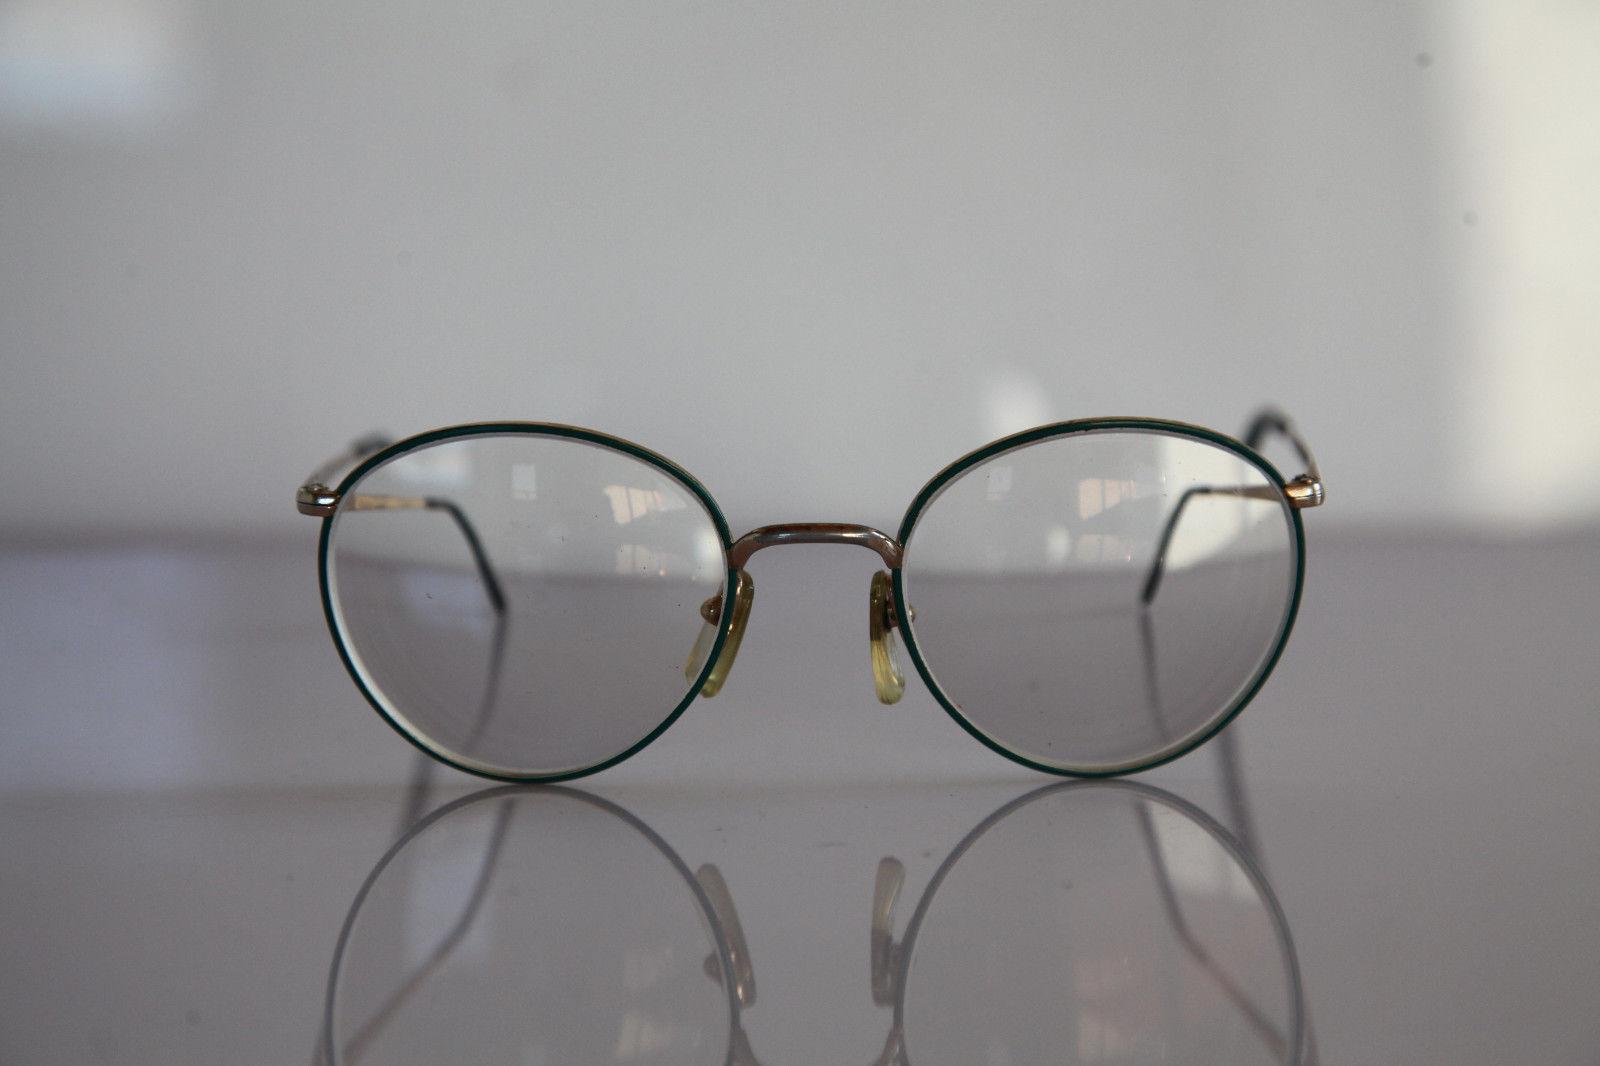 Vintage L'AMY Eyewear, Gold, Green Frame,  RX-Able Crystal Prescription lens.